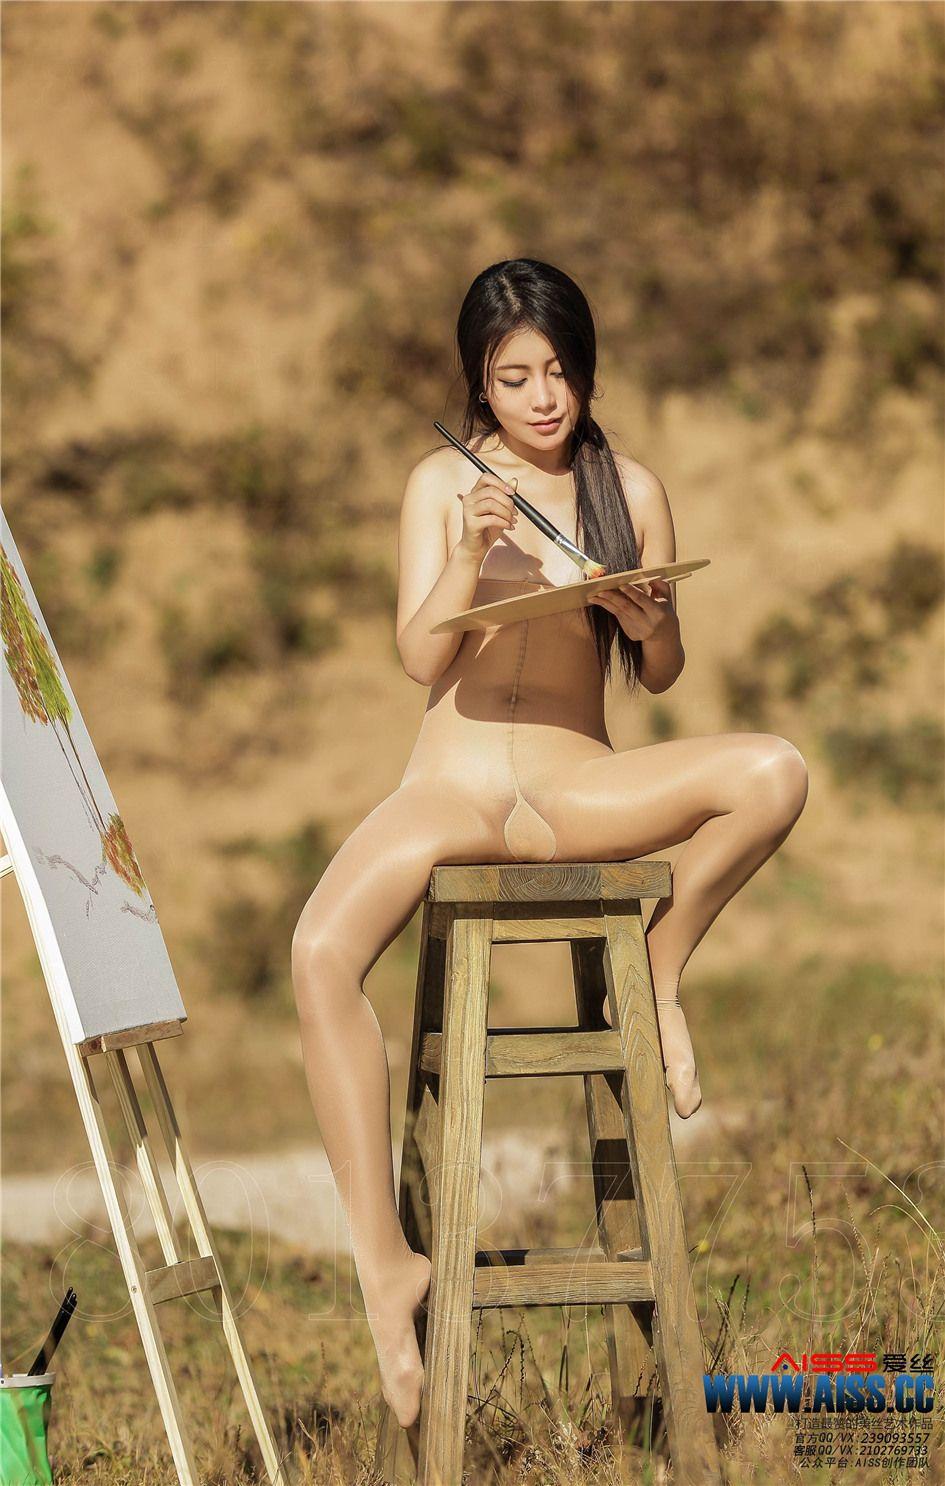 [AISS爱丝] 经典丝袜美腿外拍 第097期 《小茹的美丝